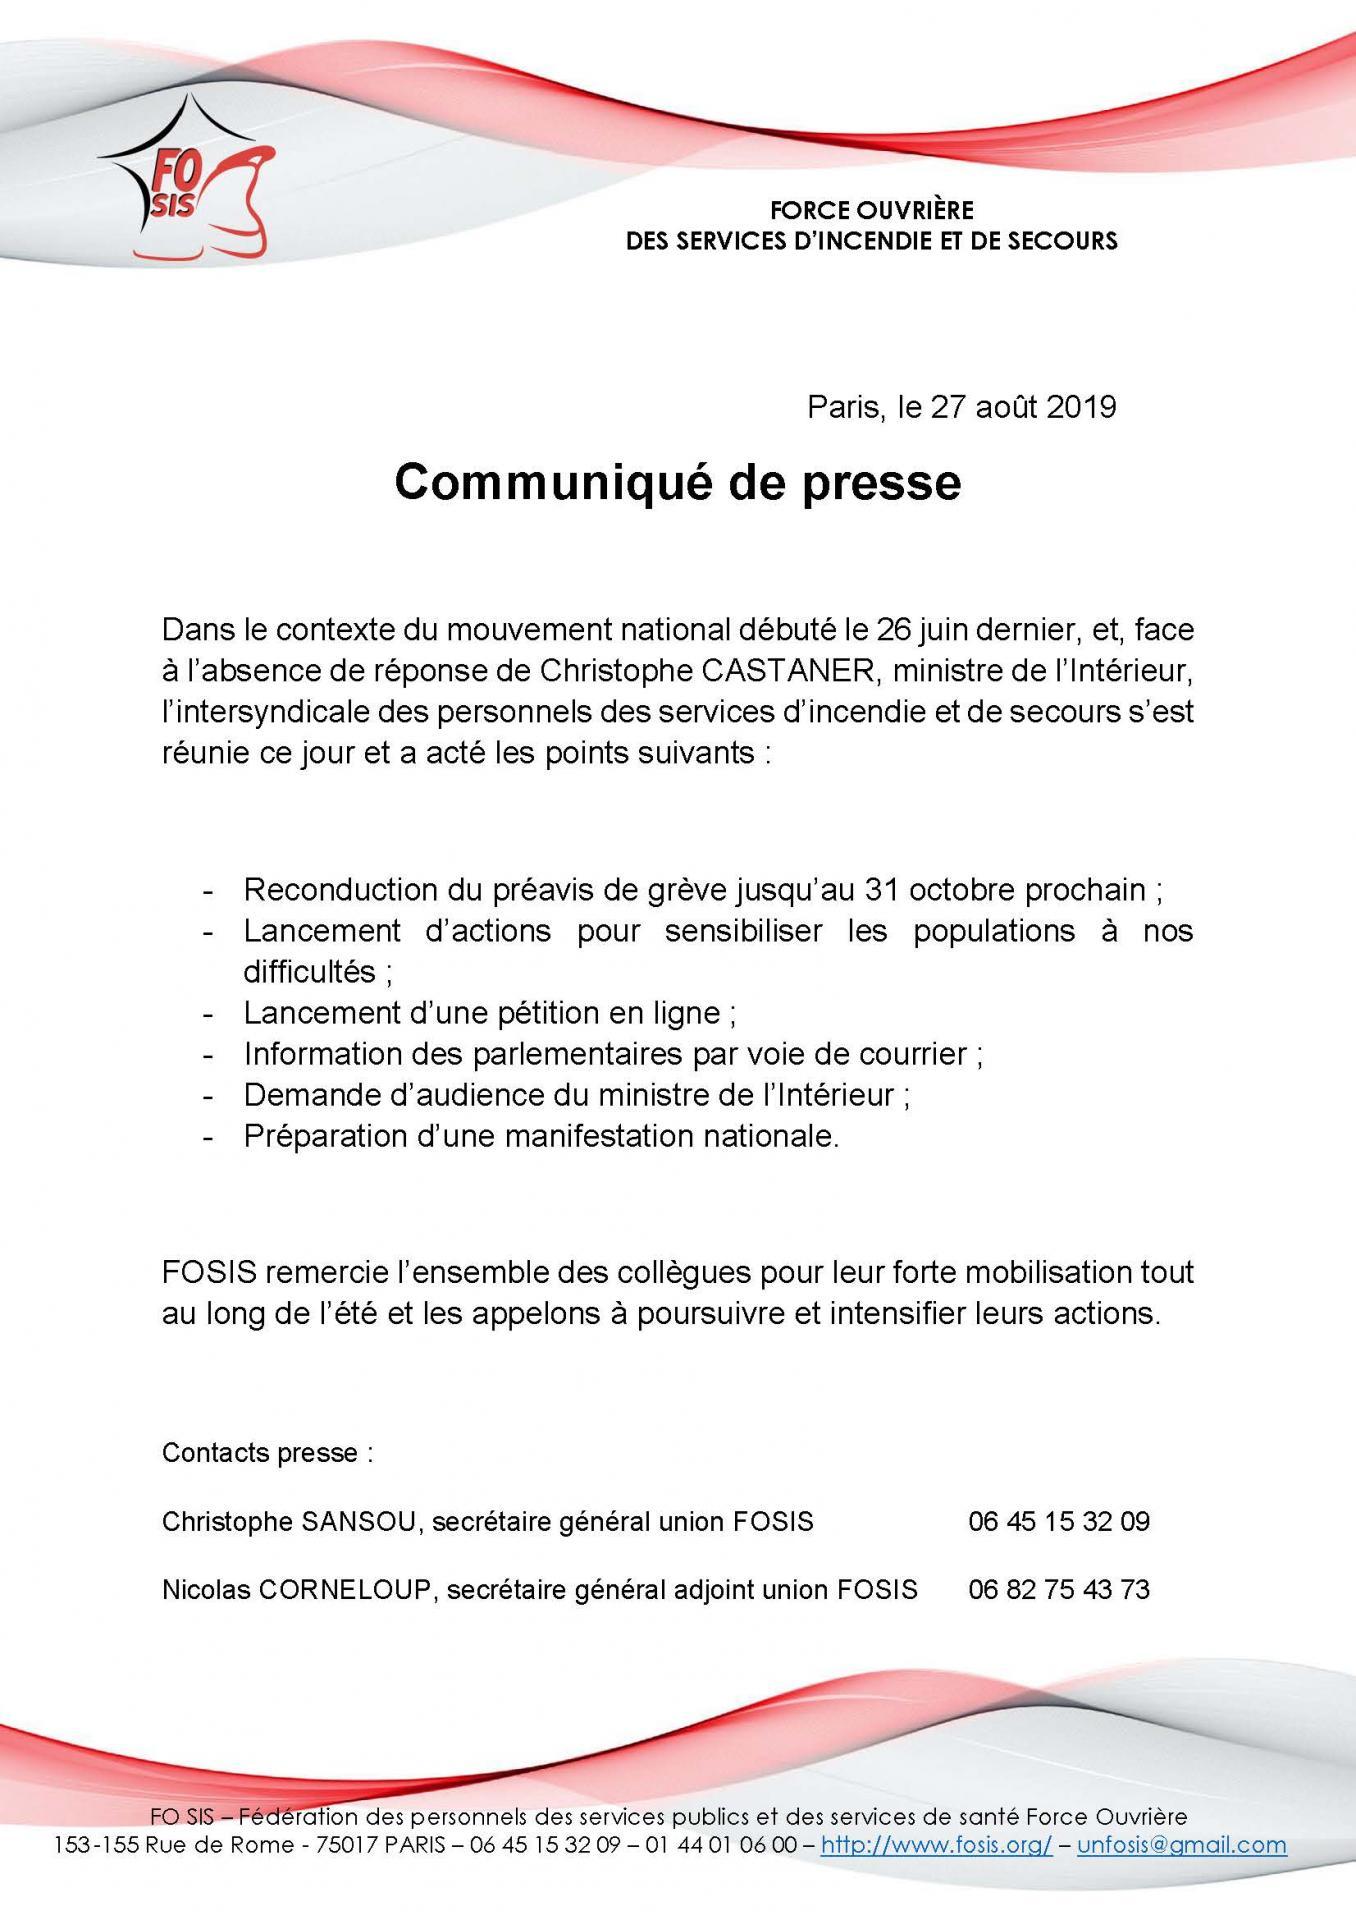 Fosis communique de presse